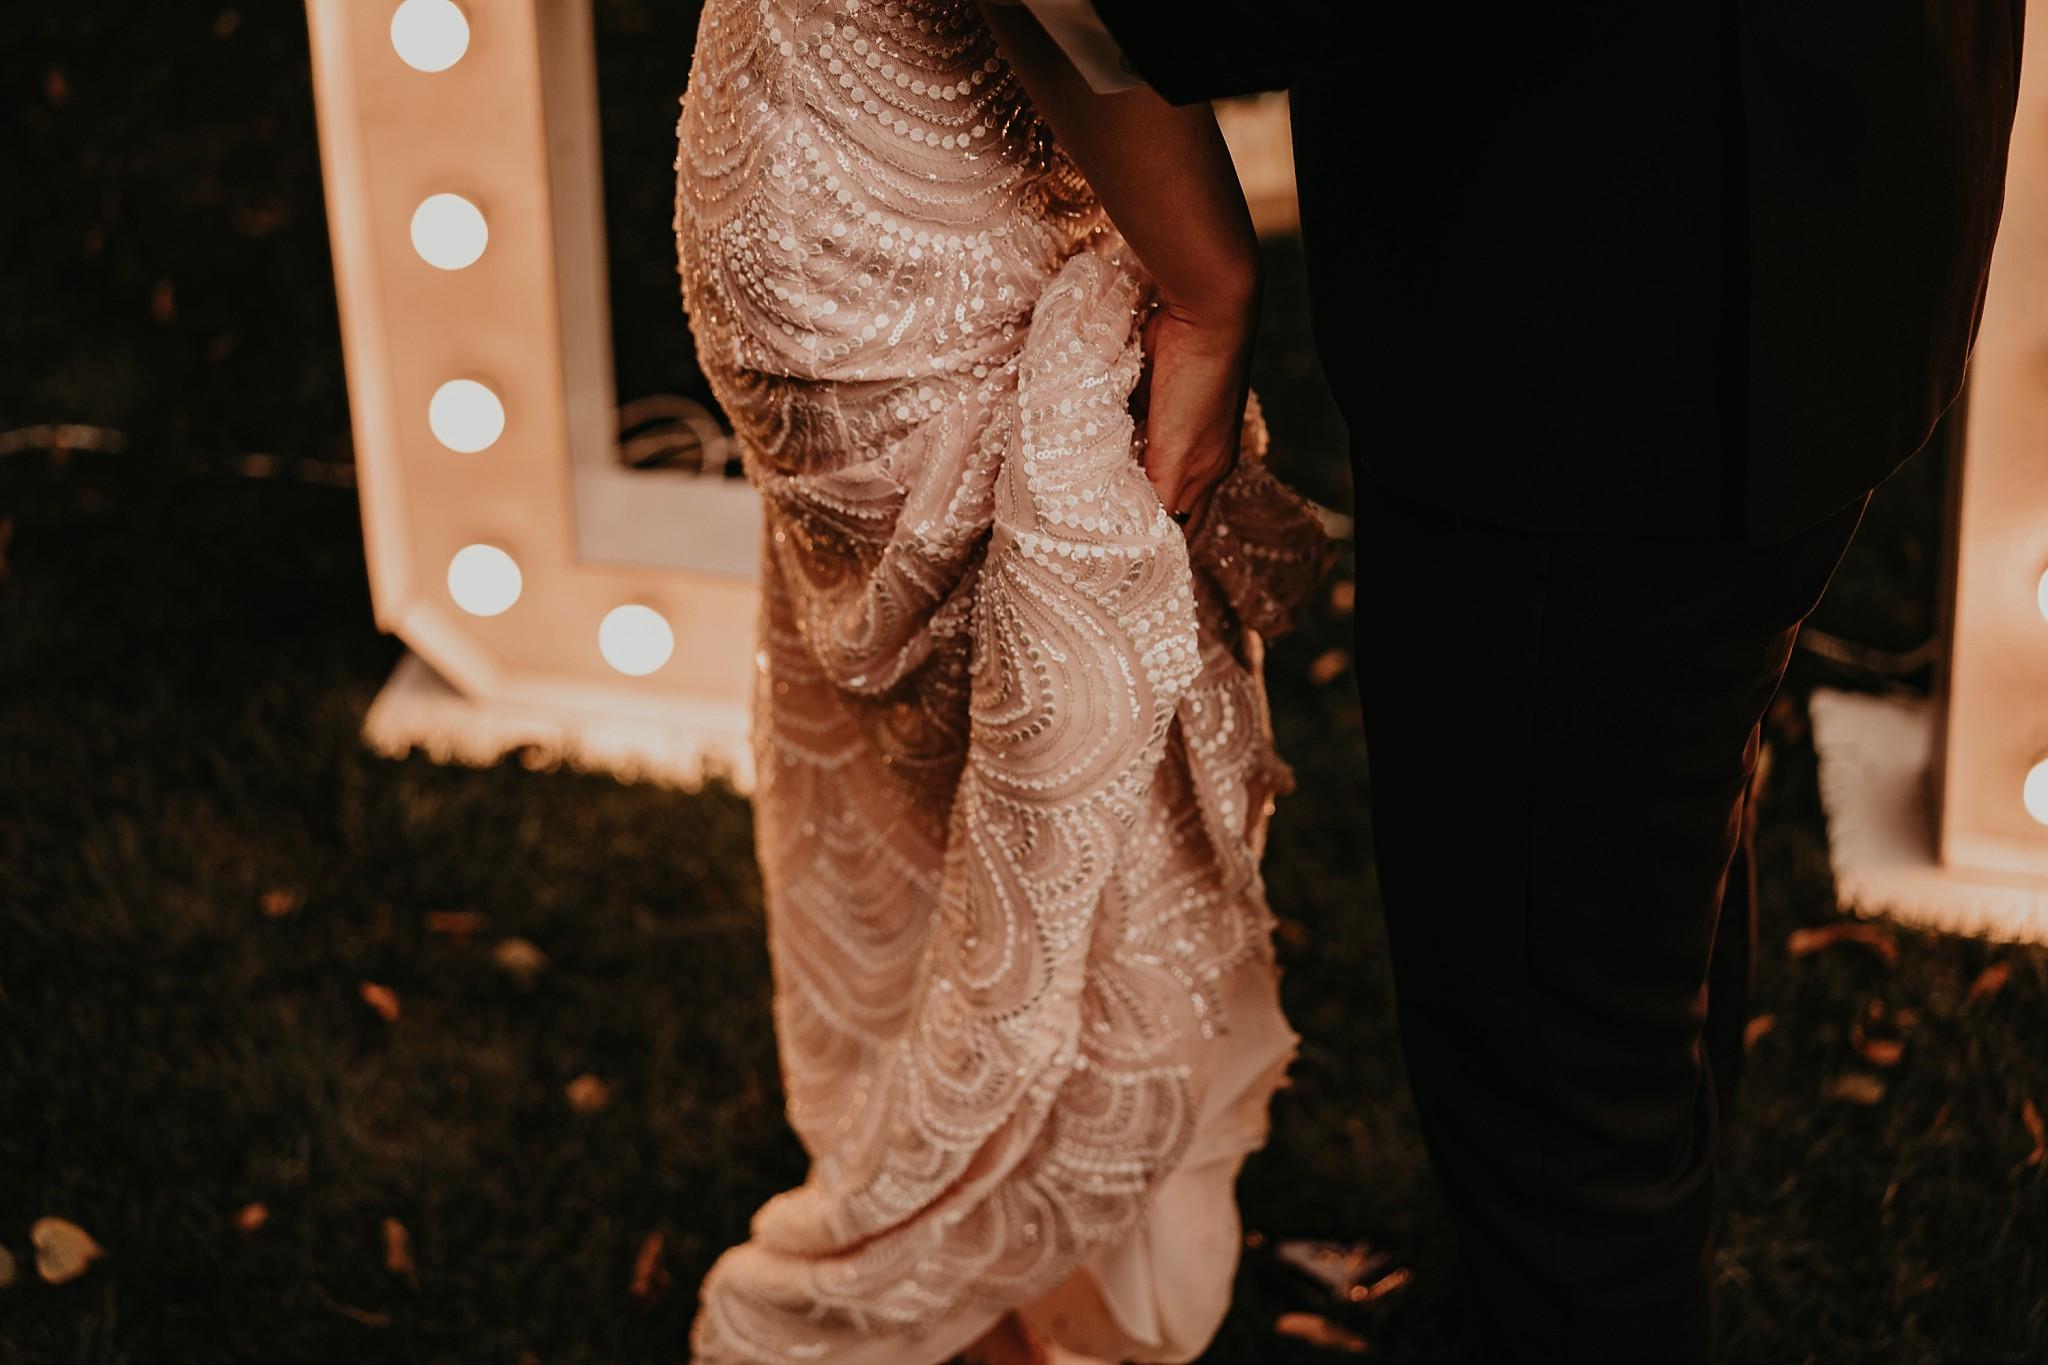 fotograf poznan wesele dobra truskawka piekne wesele pod poznaniem wesele w dobrej truskawce piekna para mloda slub marzen slub koronawirus slub listopad wesele koronawirus 343